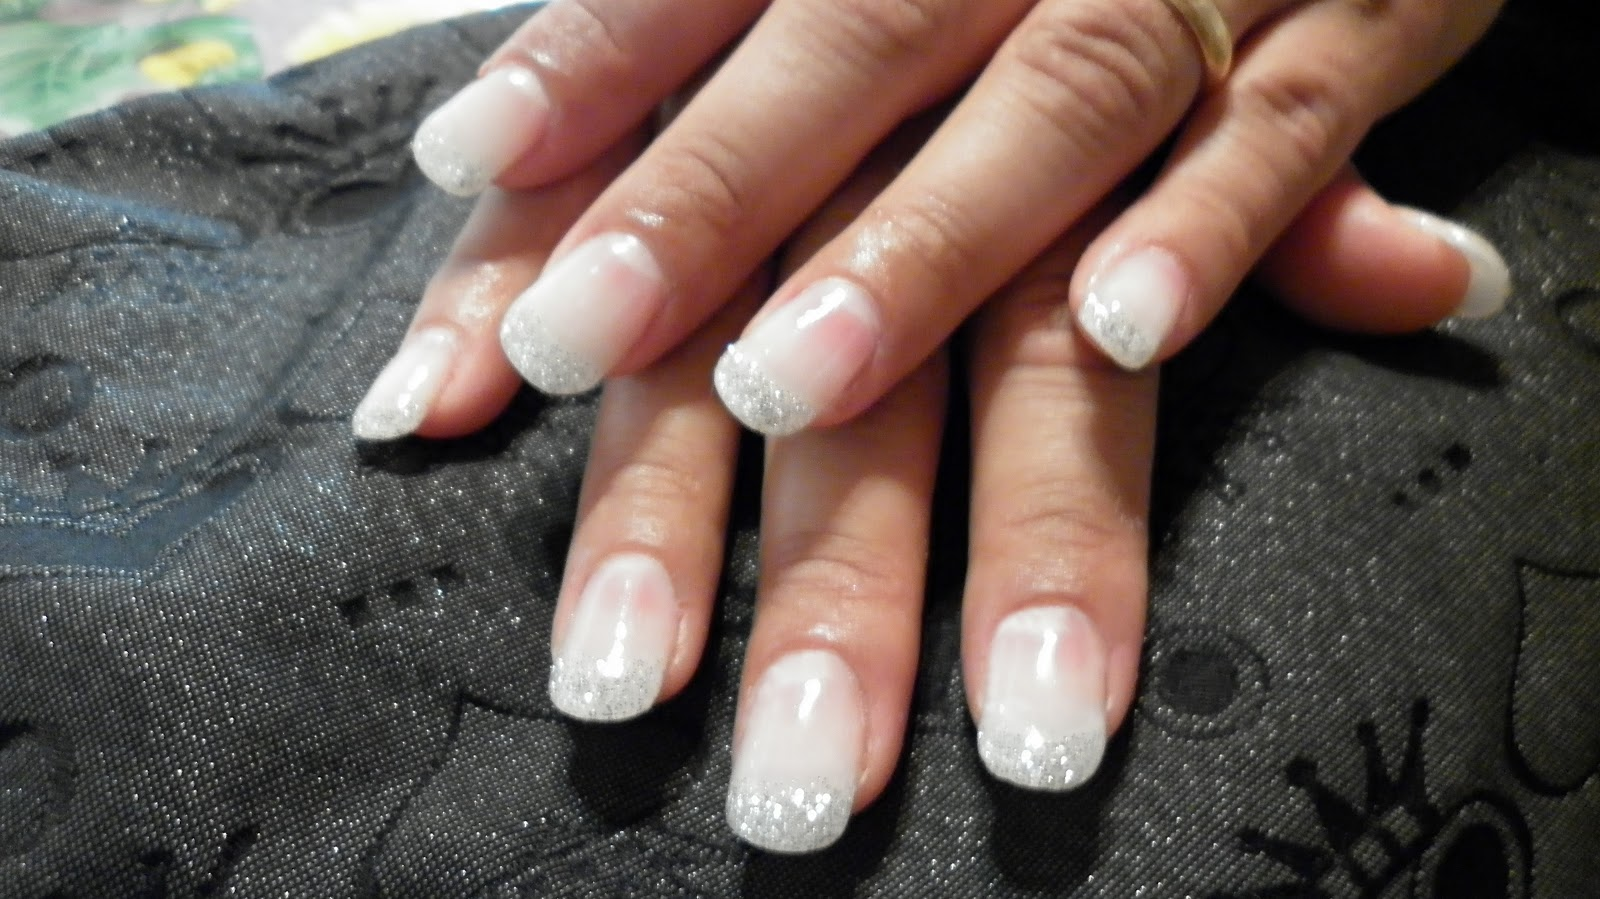 Estremamente 13: Manicure e Pedicure-Ricostruzione unghie - Colata di gel  UC04